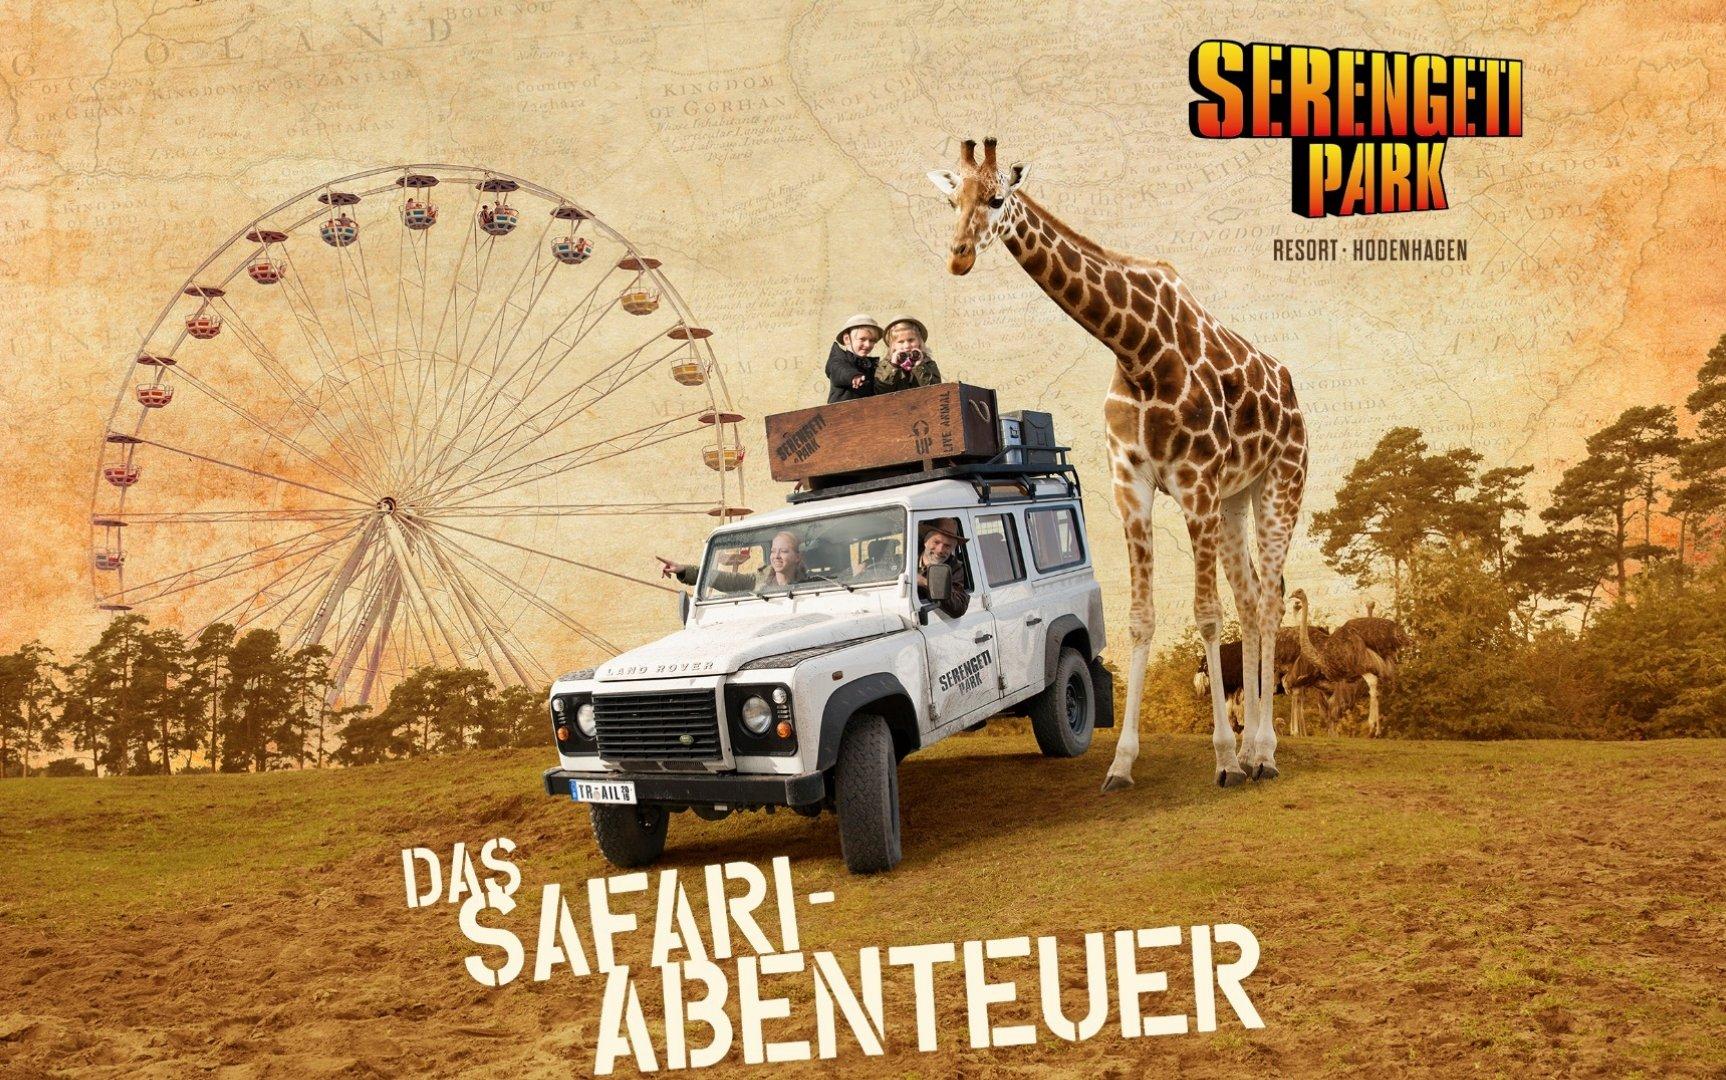 Serengeti-Park Hodenhagen GmbH  in 29693 Hodenhagen